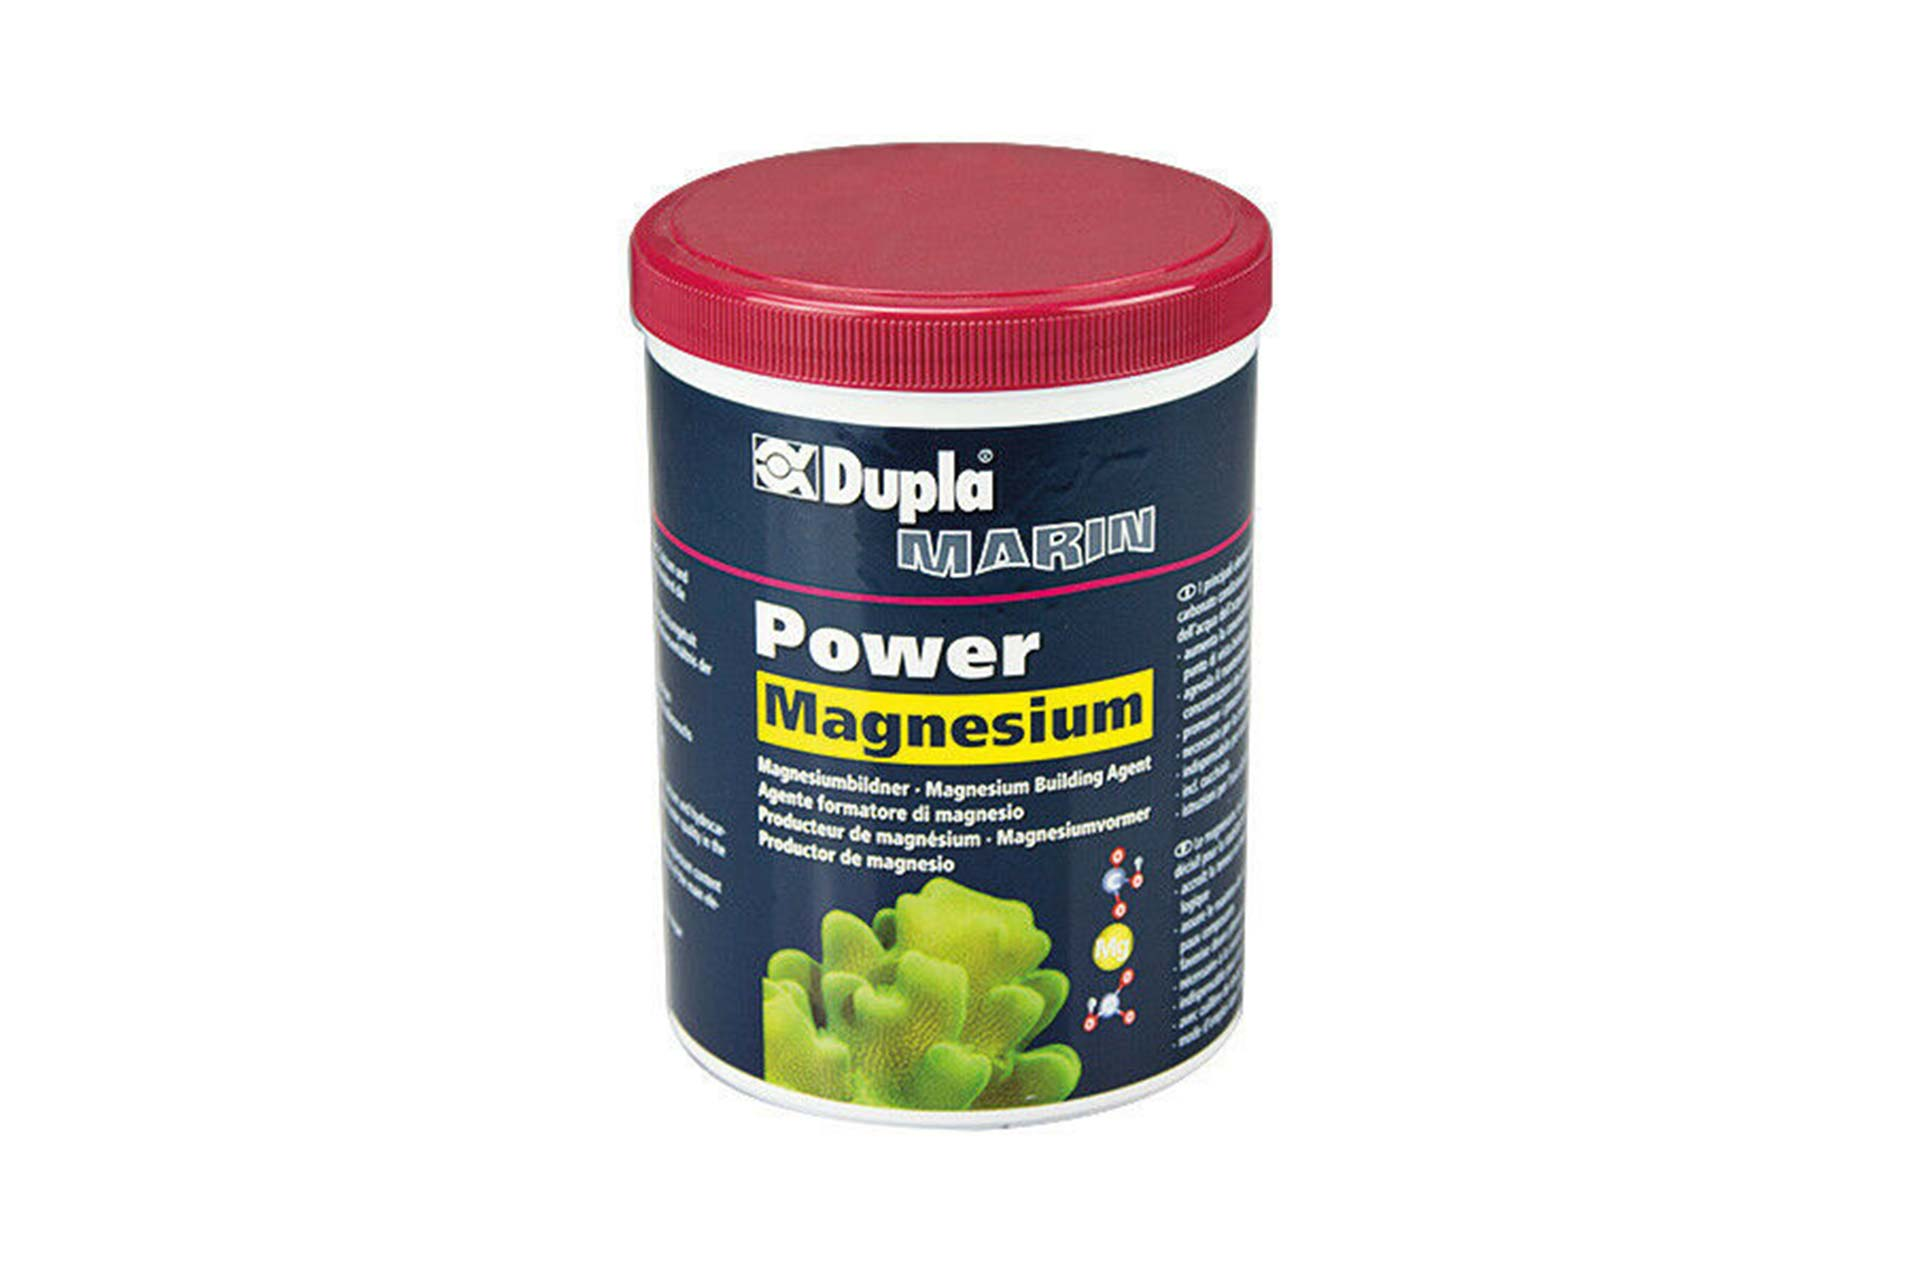 Dupla Power Magnesium 800g